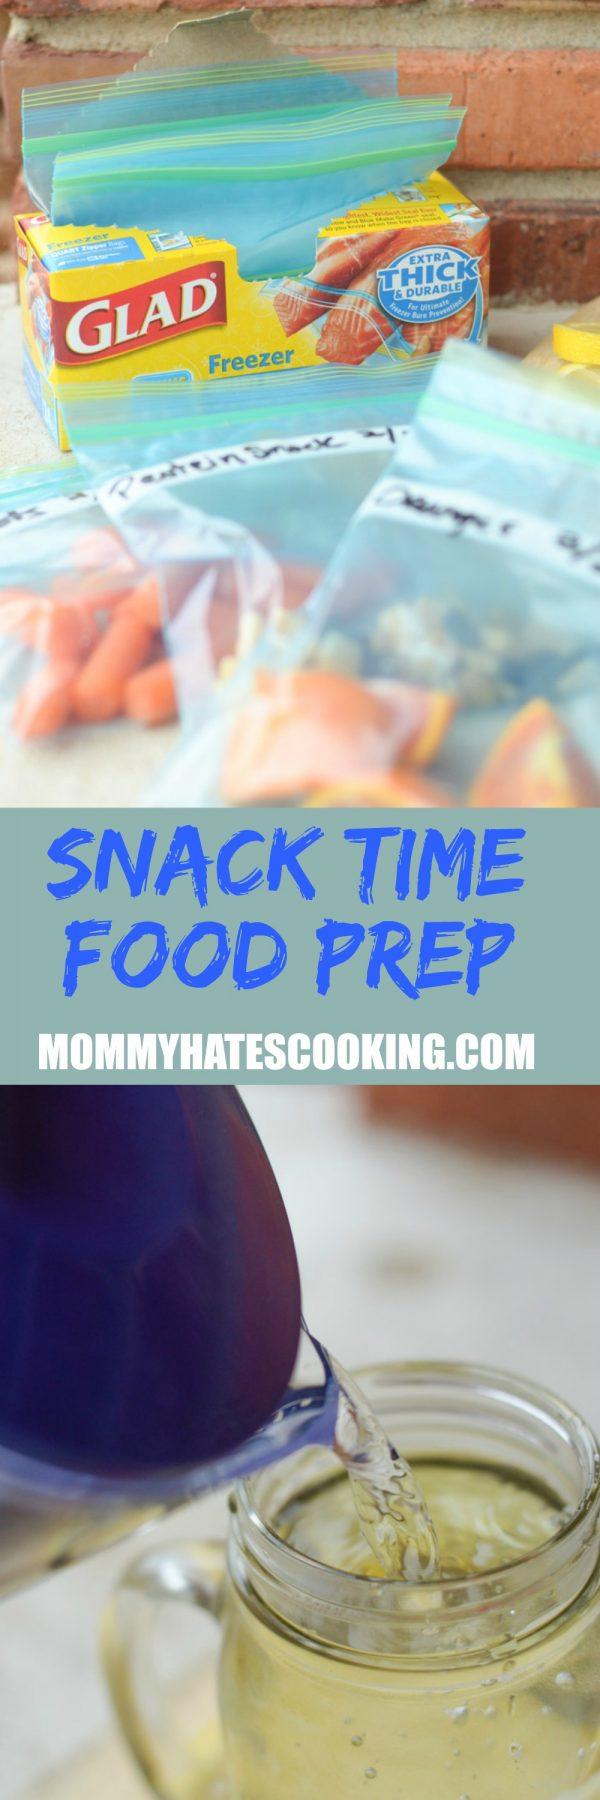 5 TIPS FOR FOOD PREP